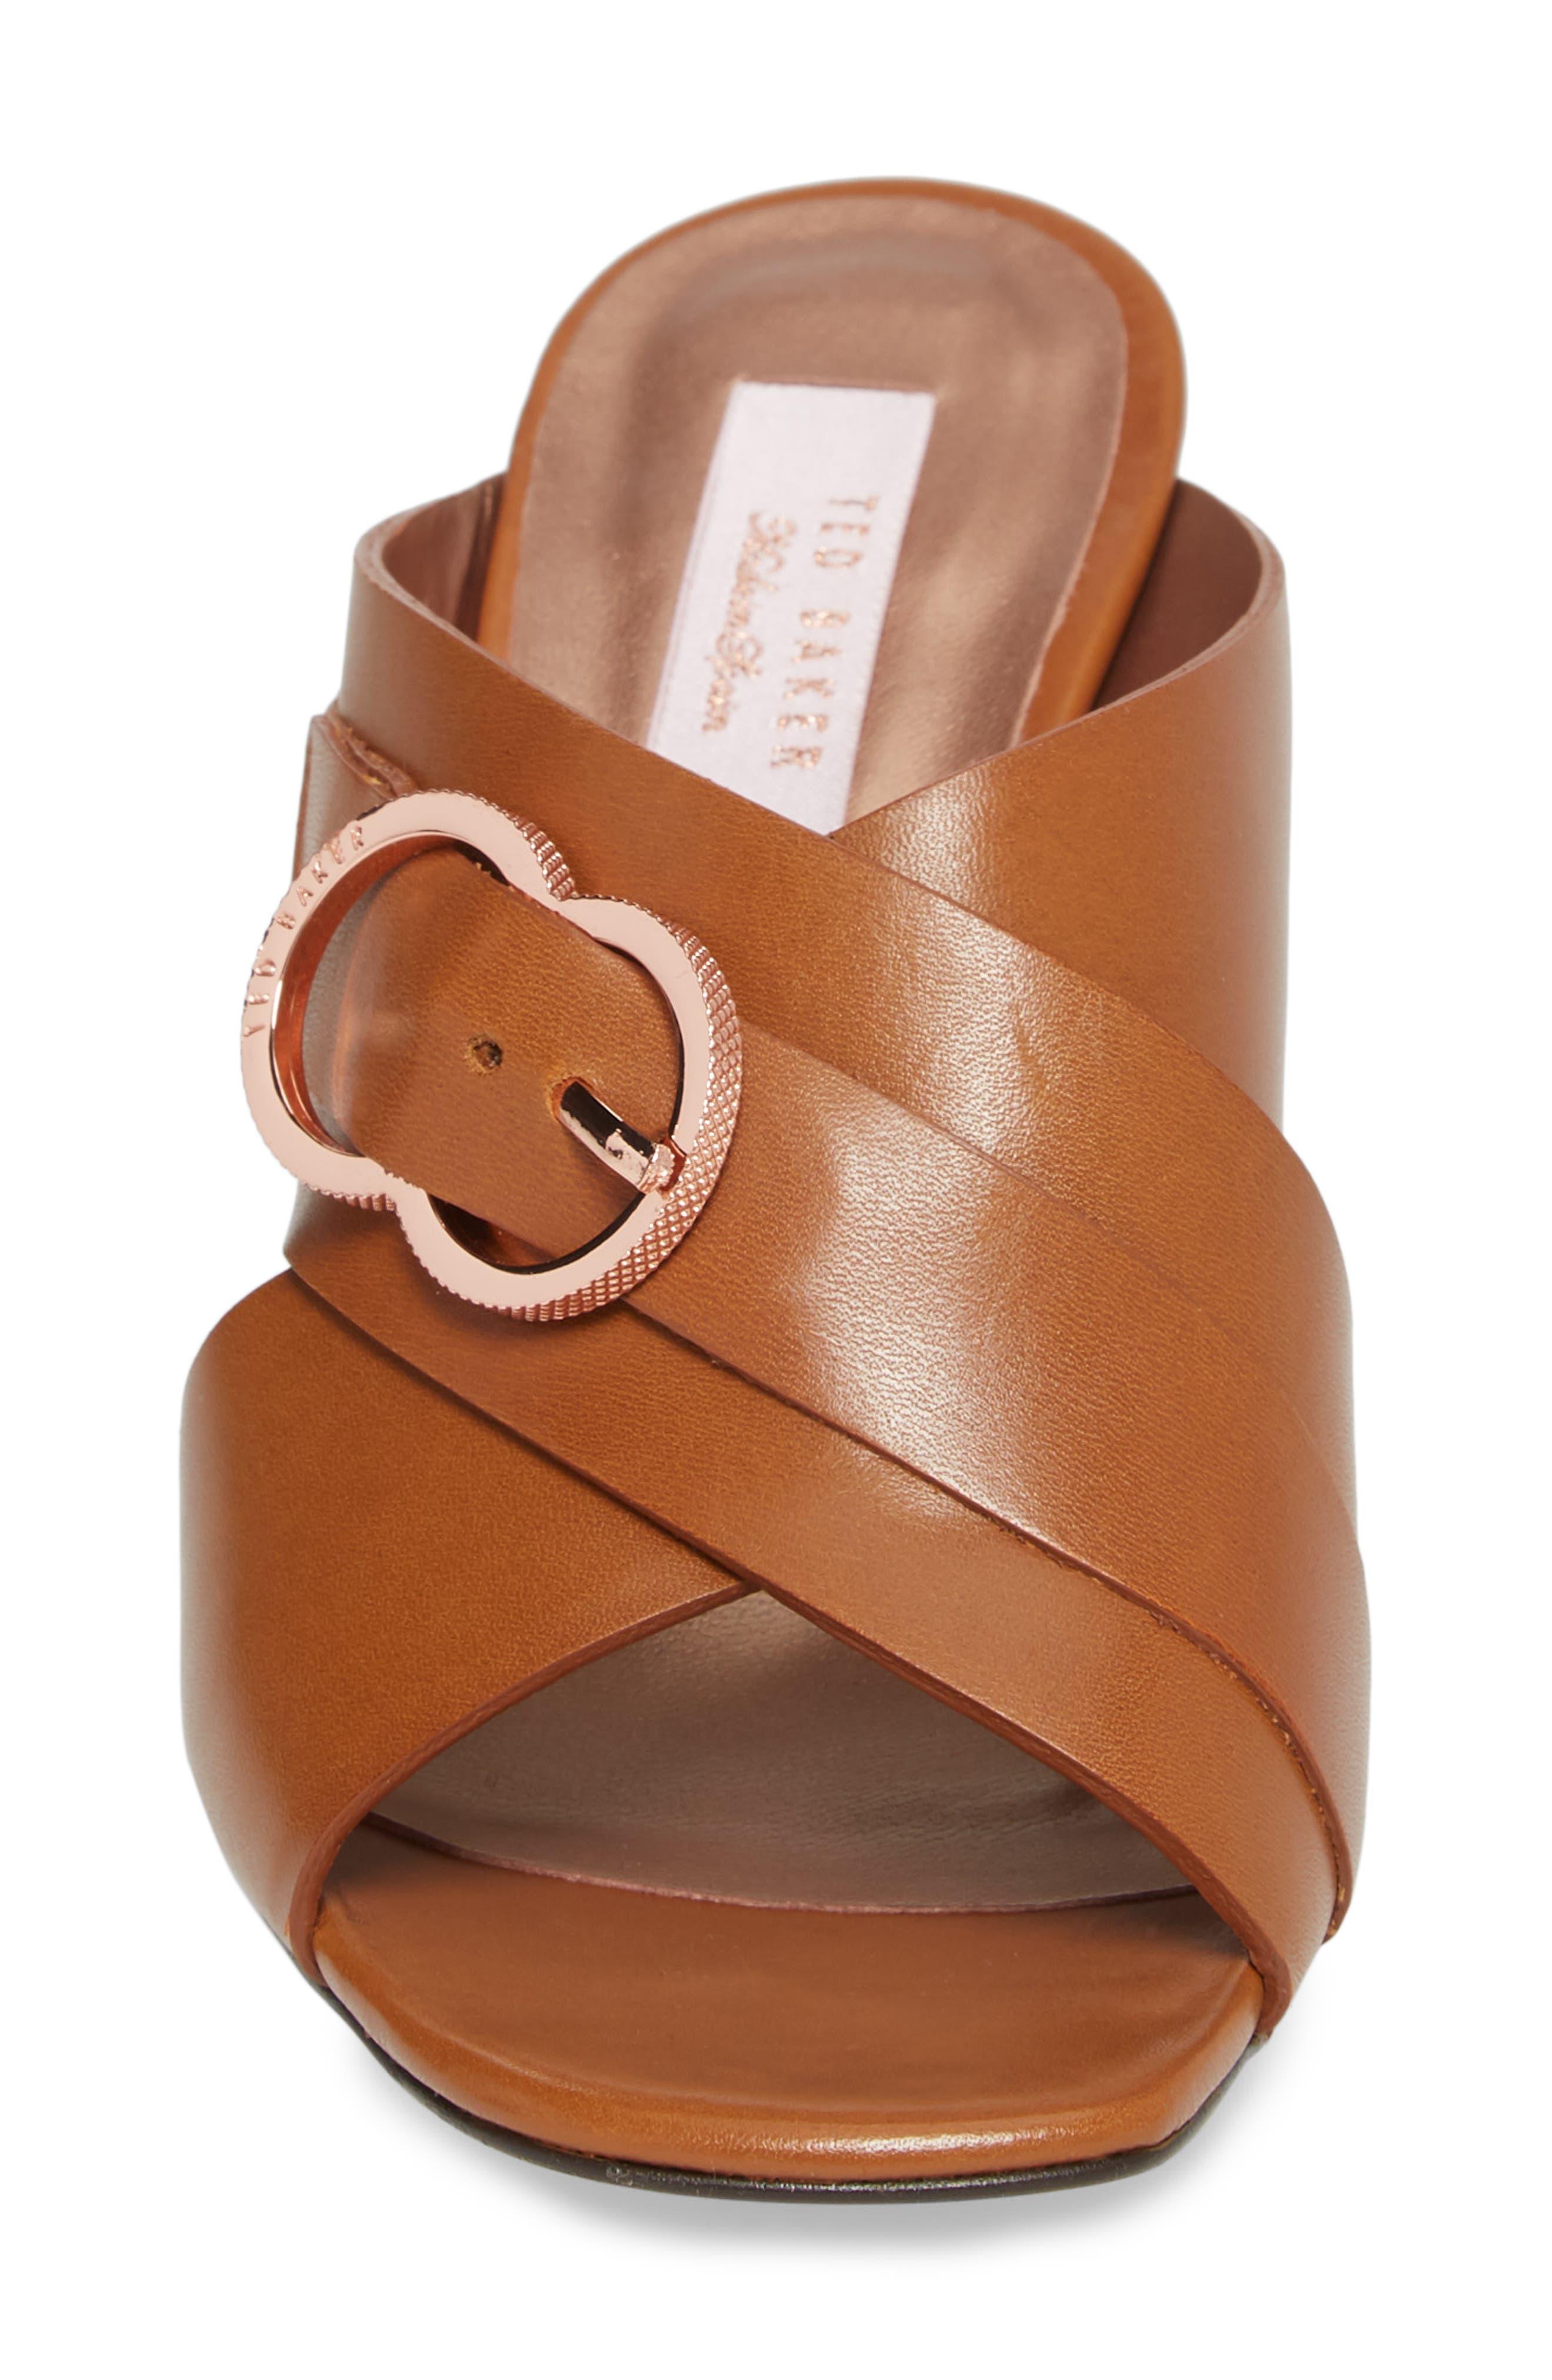 Maladas Slide Sandal,                             Alternate thumbnail 4, color,                             Tan Leather